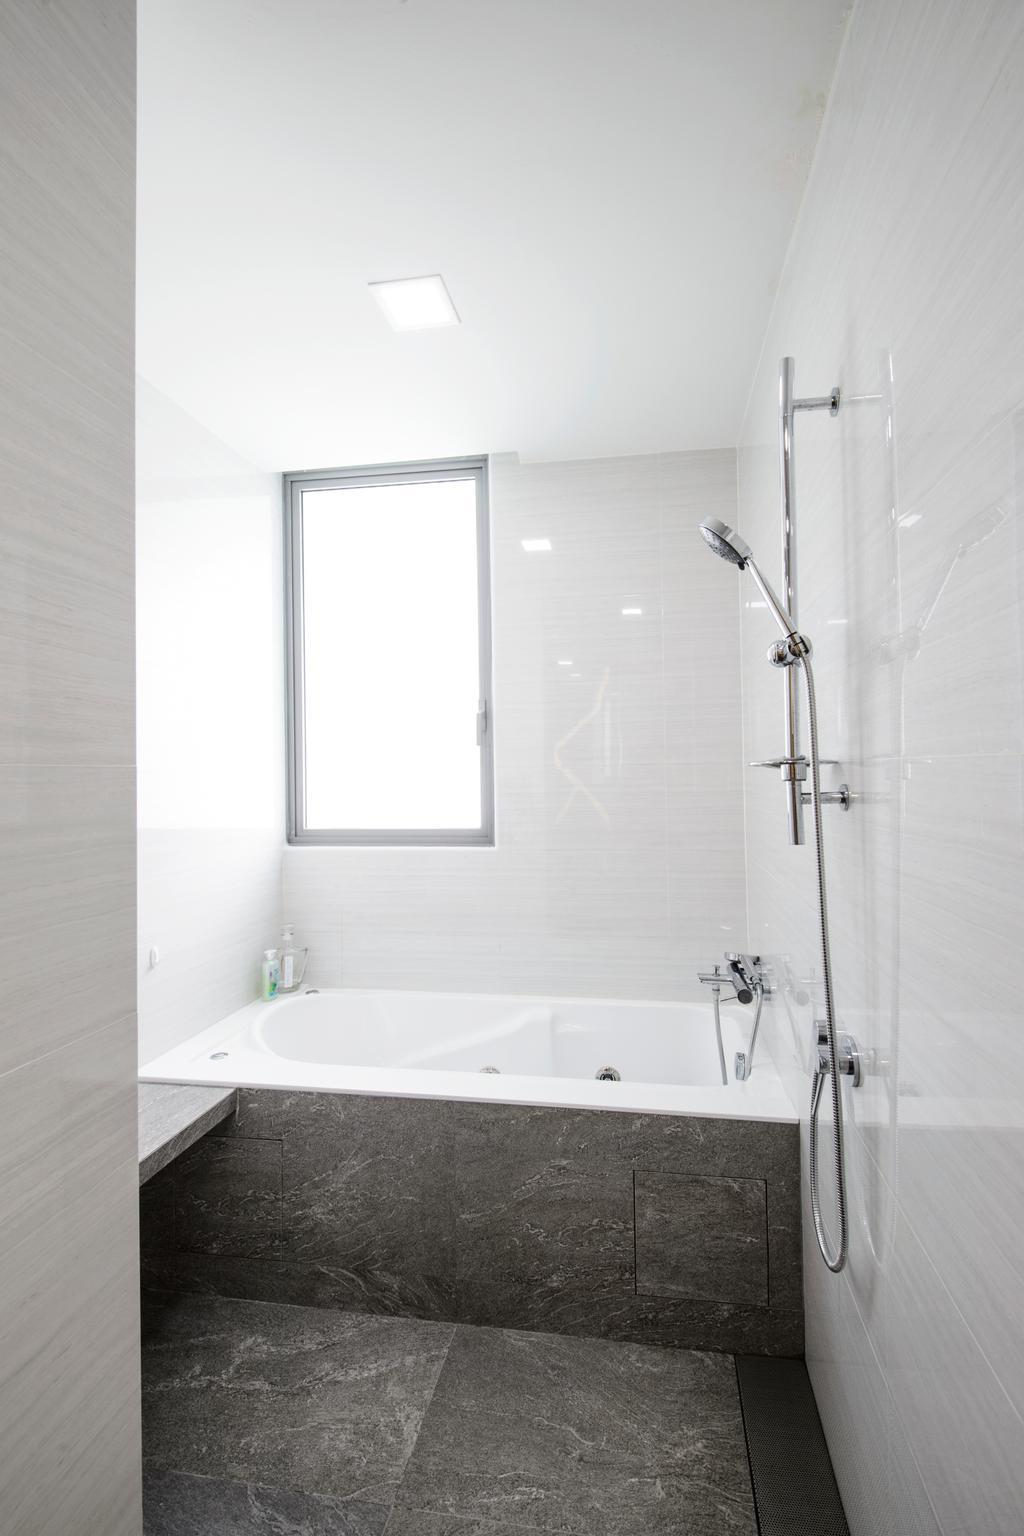 Eclectic, Condo, Bathroom, A Treasure Trove, Interior Designer, Hue Concept Interior Design, Indoors, Interior Design, Room, Shower